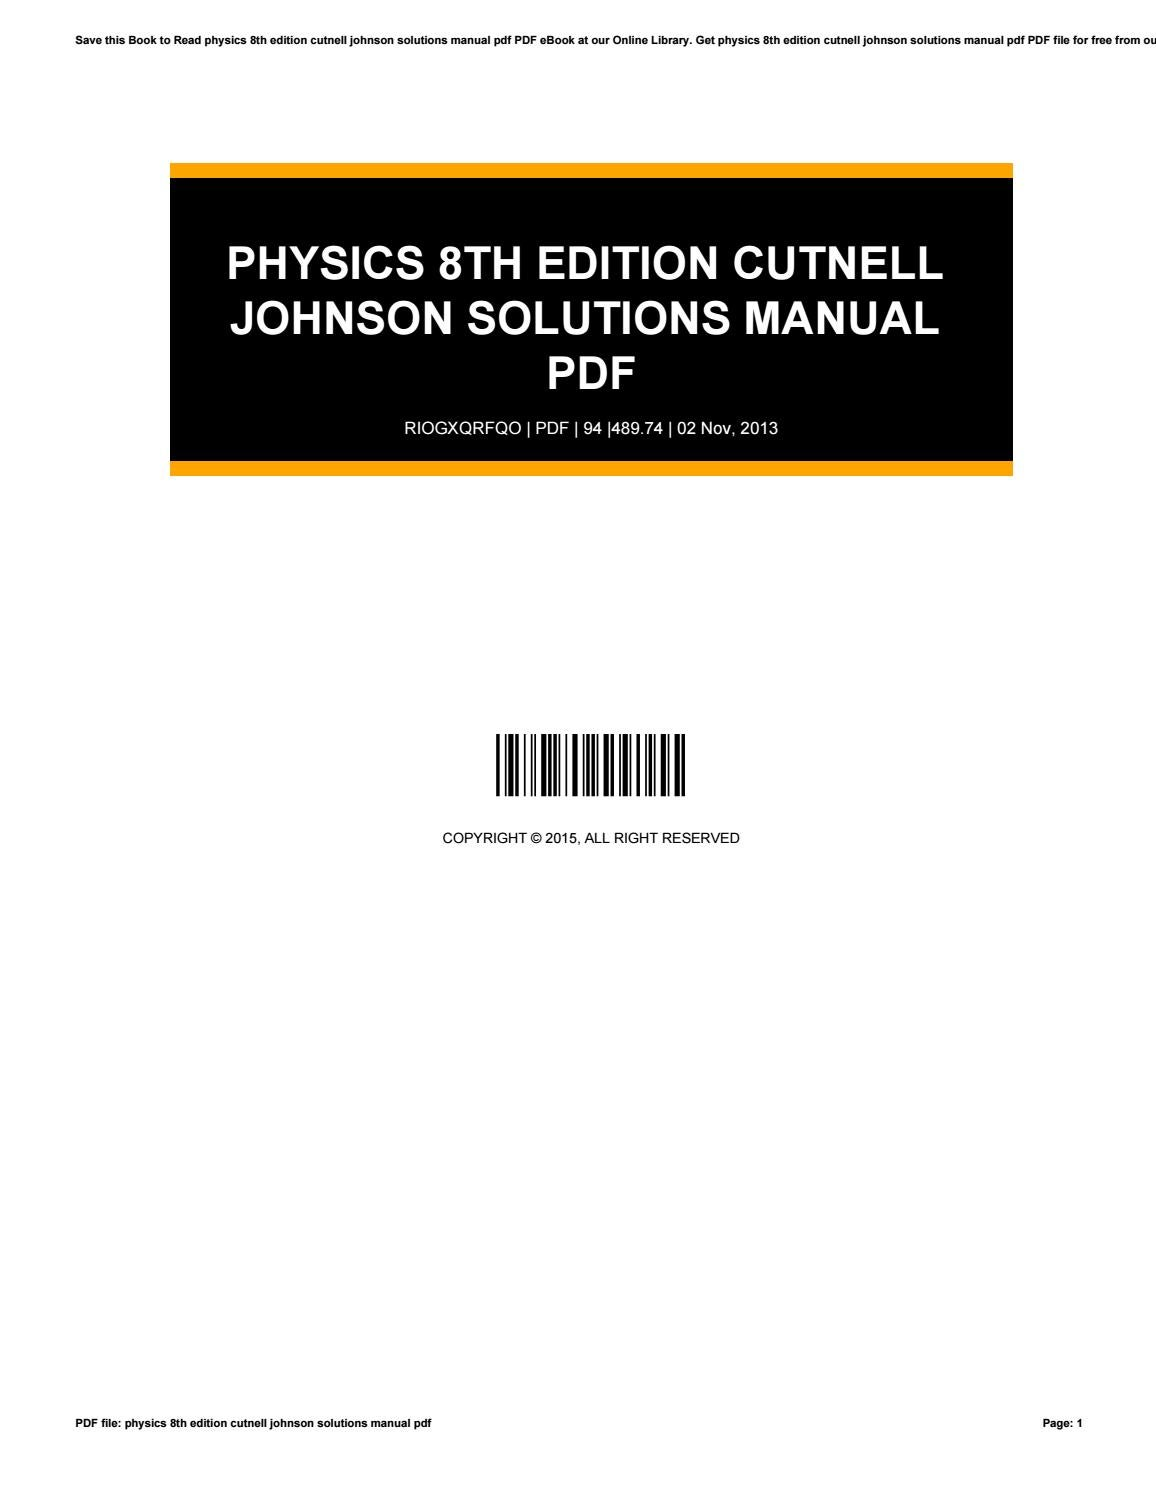 Physics 8th edition cutnell johnson solutions manual pdf by  WillieClifford4144 - issuu